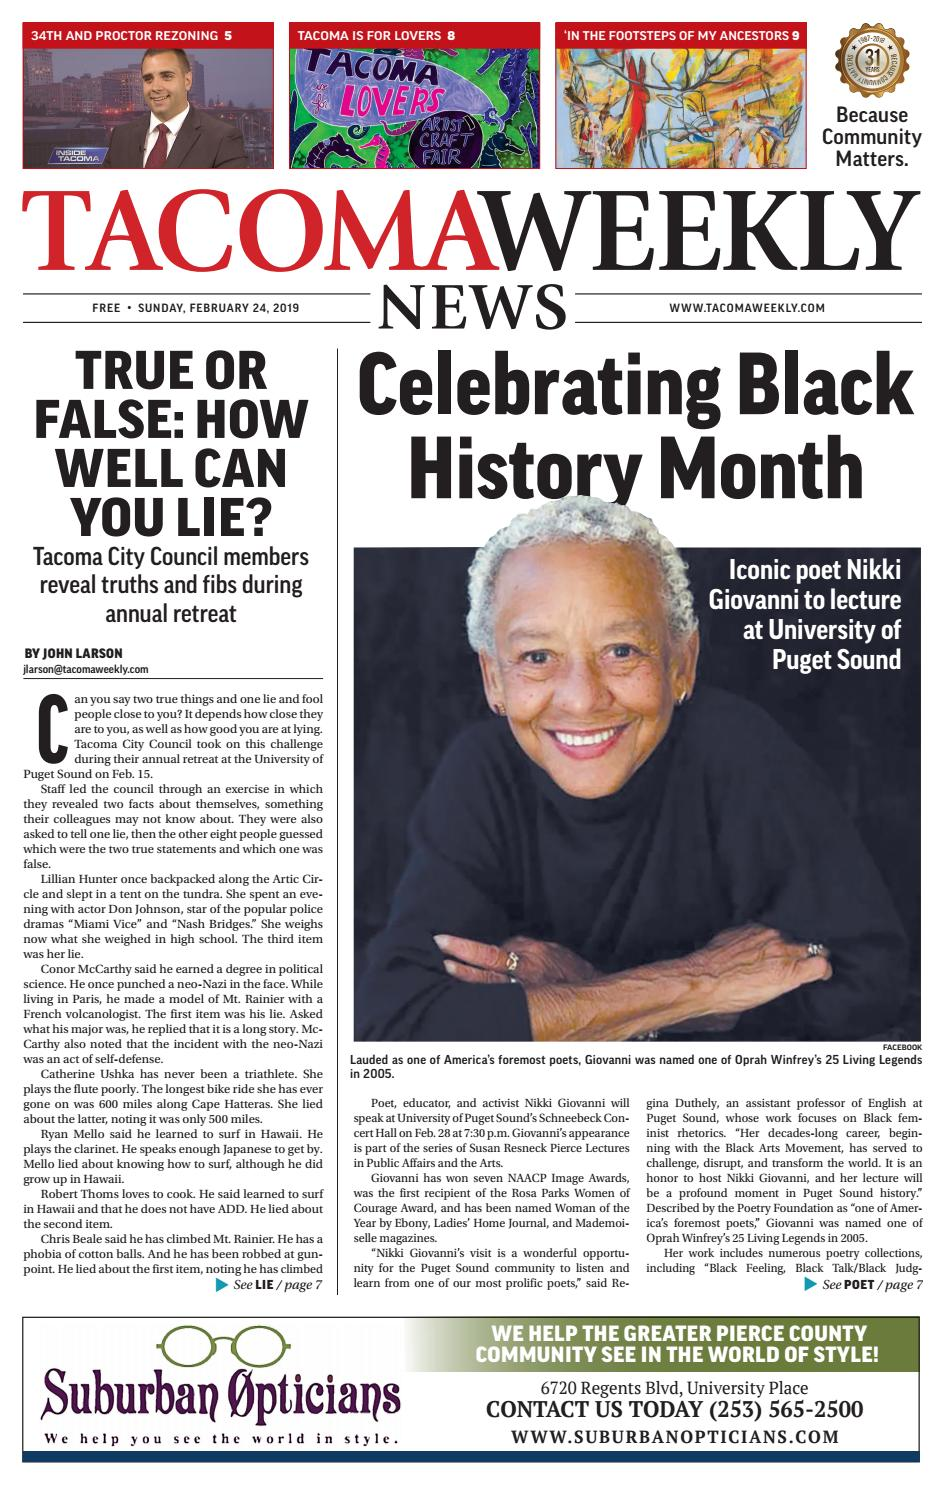 90773675a4 Tacoma Weekly 02.24.19 by Tacoma Weekly News - issuu